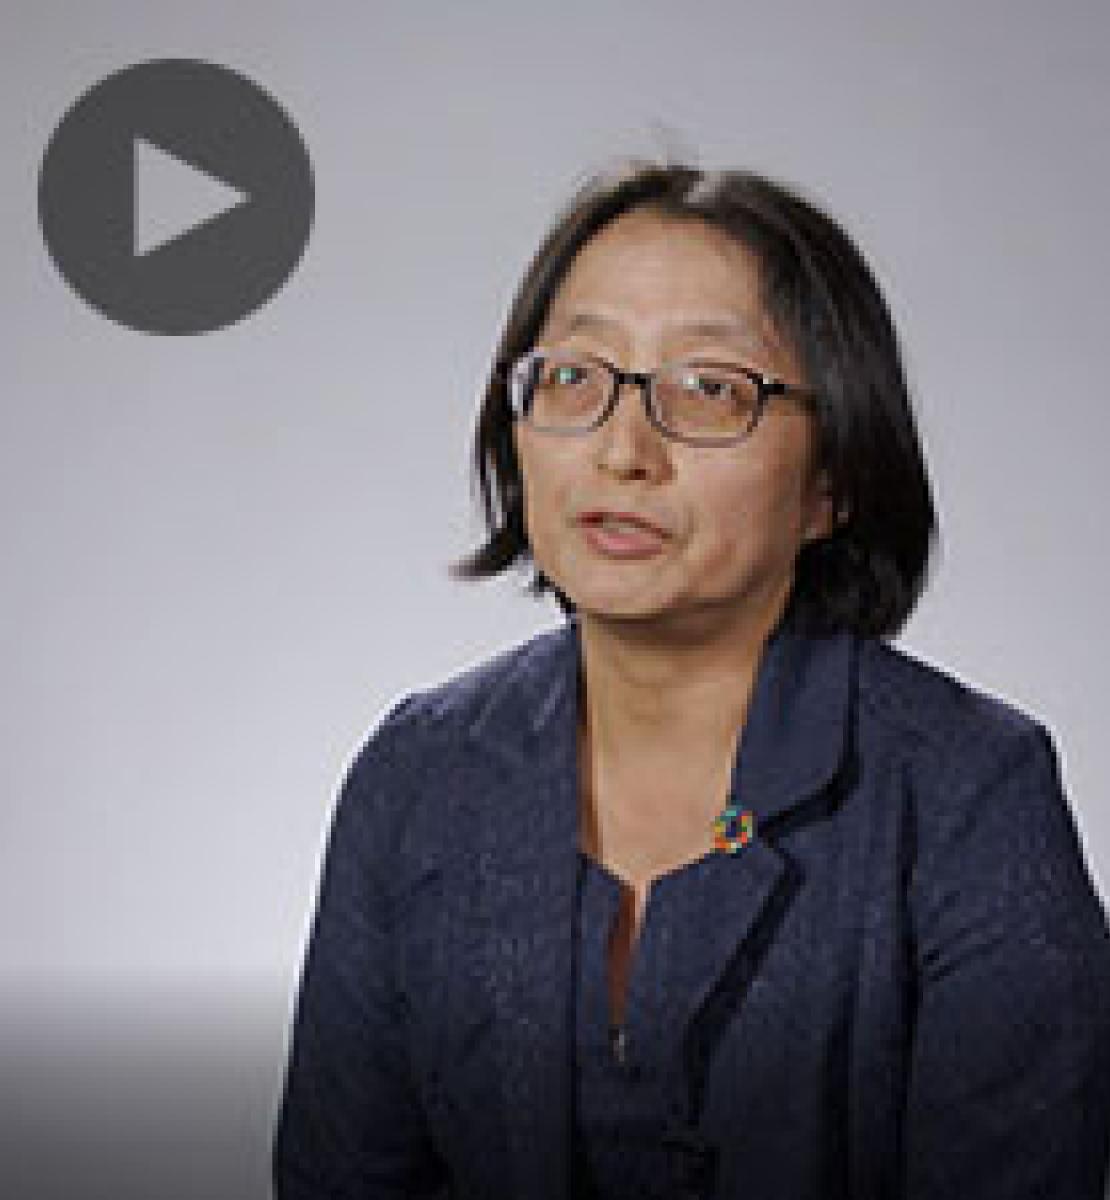 Screenshot from video message shows Resident Coordinator, Mikiko Tanaka